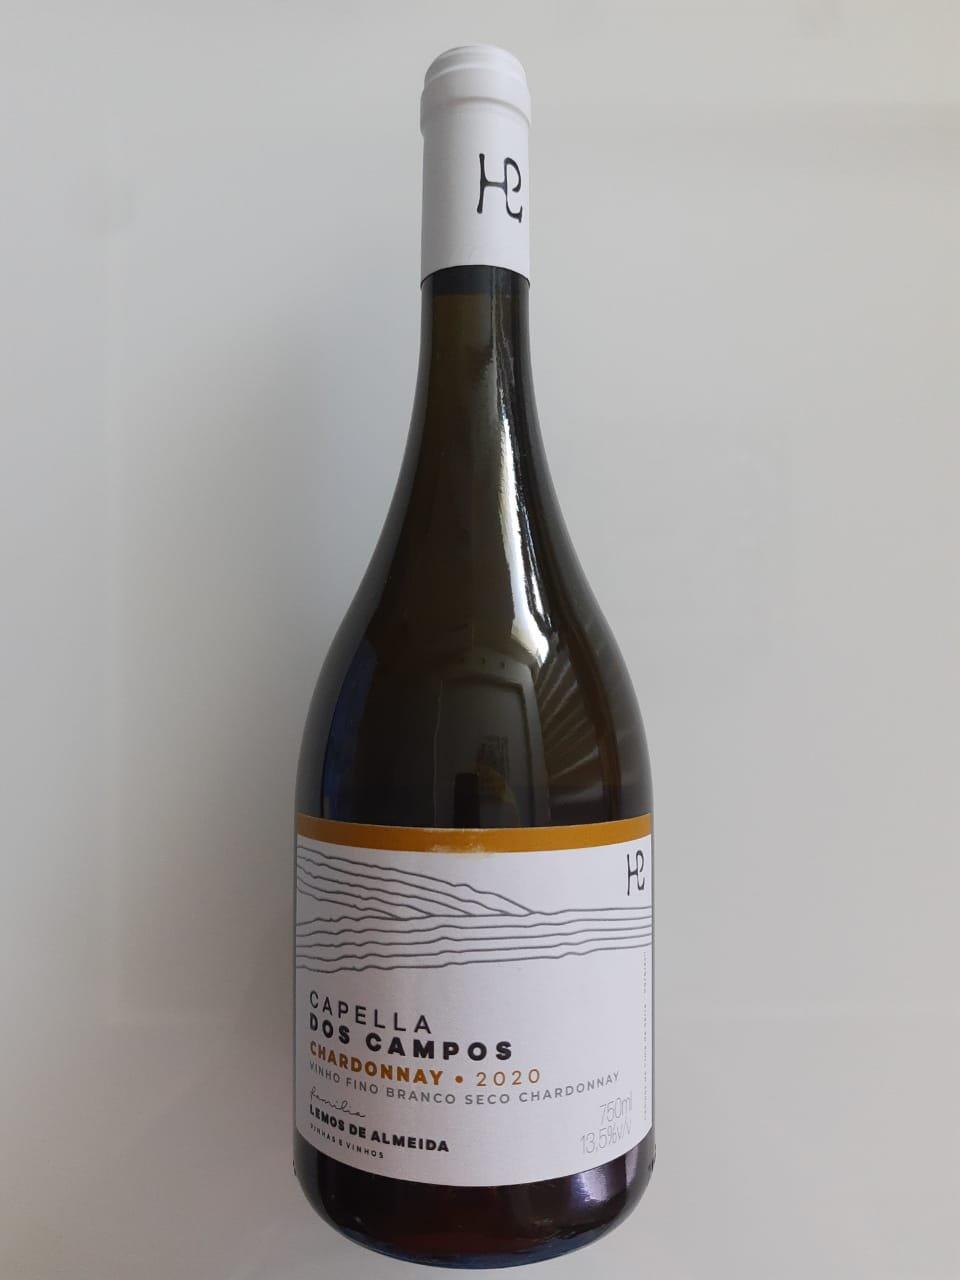 Vinho Capella Dos Campos Chardonnay 750ml